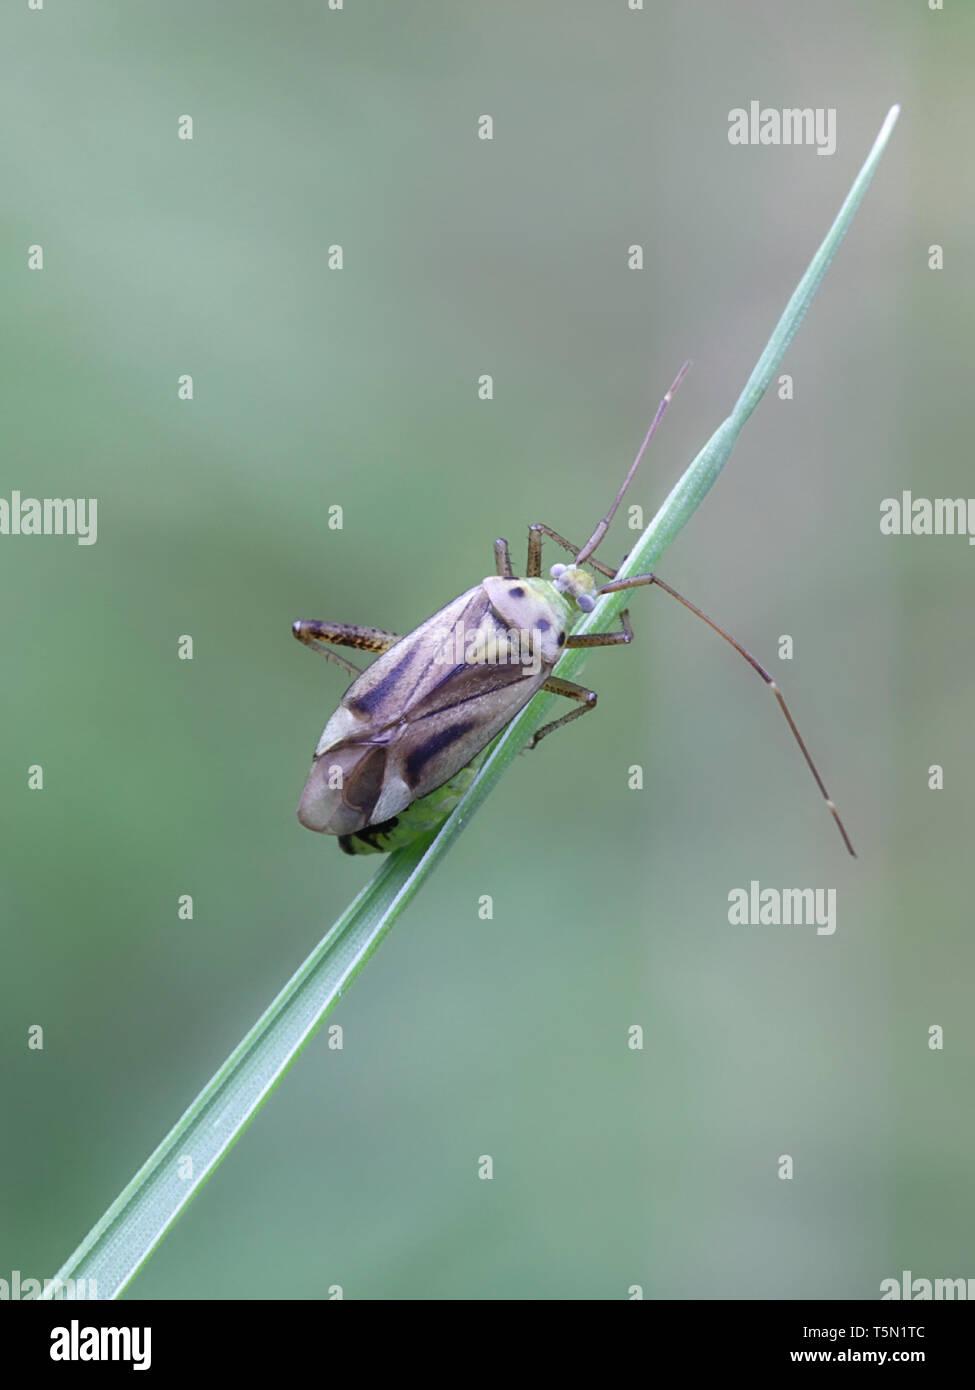 Capsid bug, also called mirid bug, Adelphocoris quadripunctatus - Stock Image